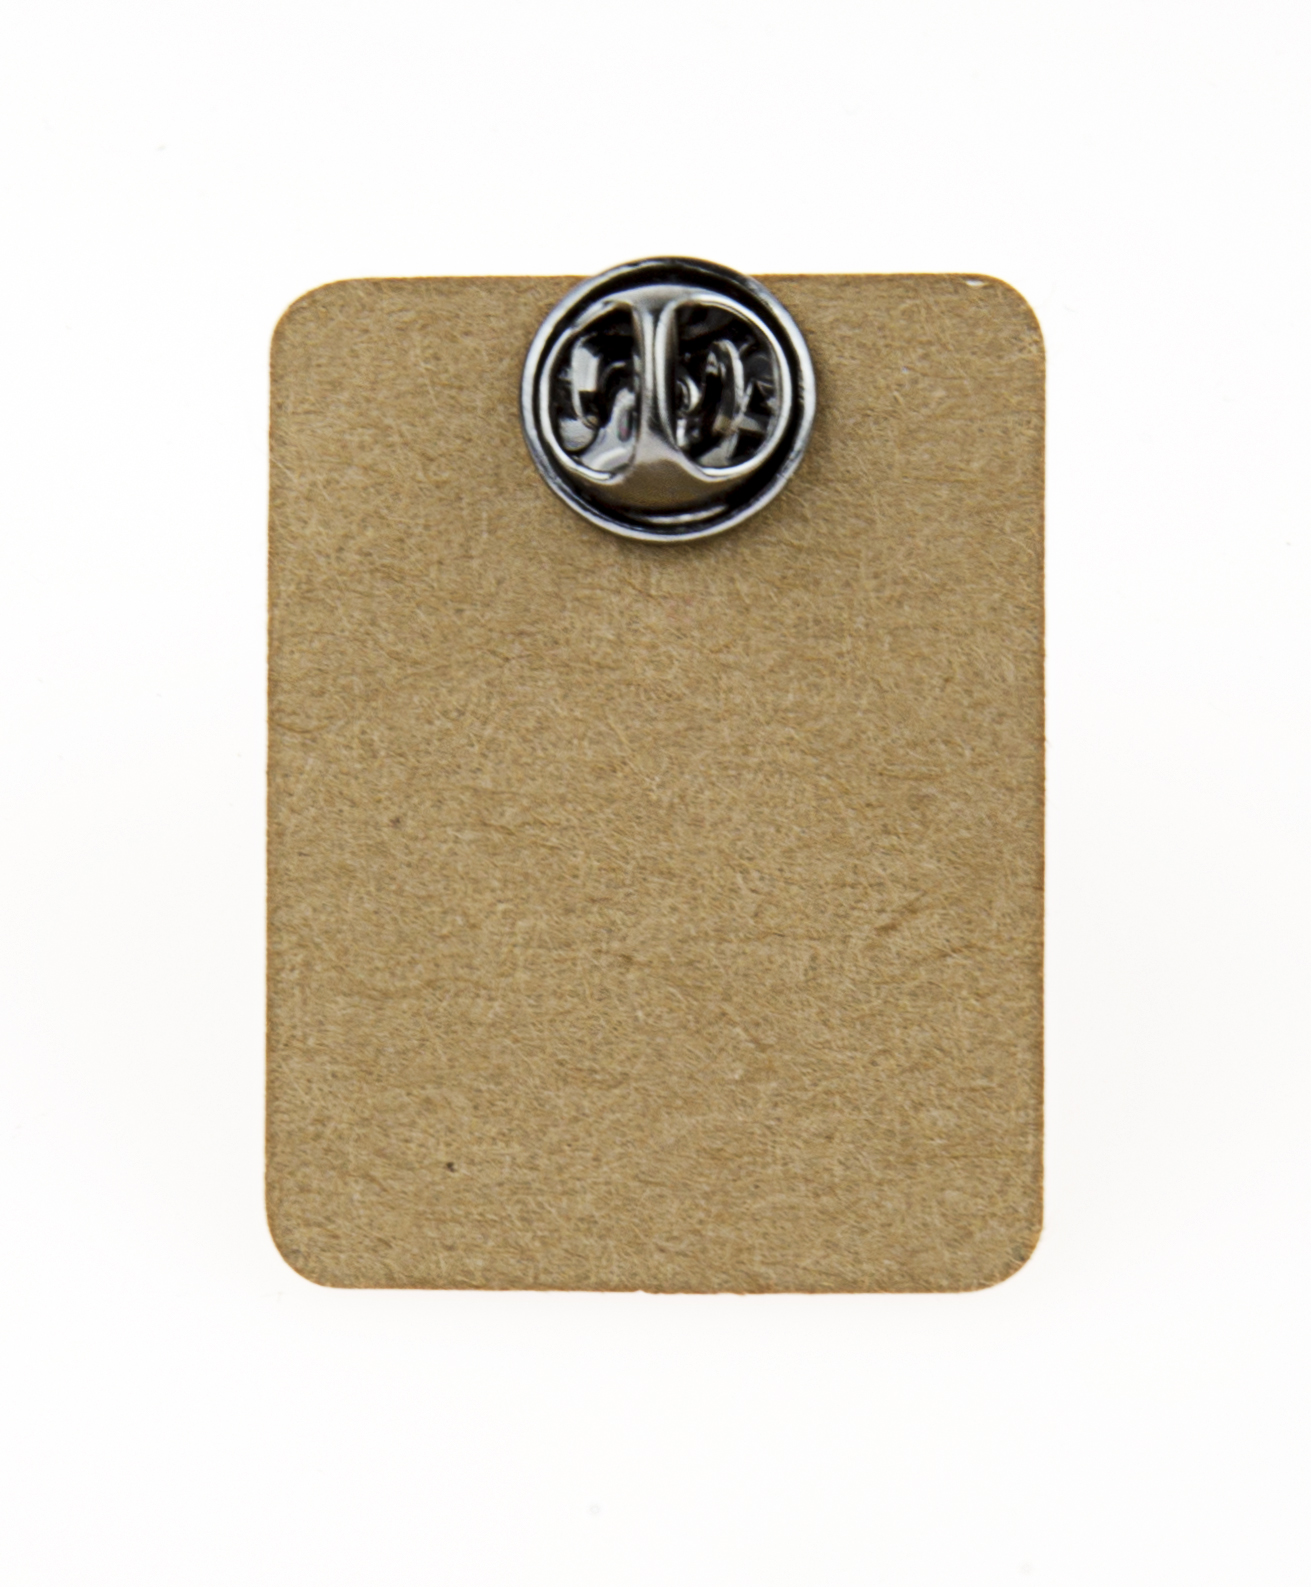 Metal Puss in Boots Enamel Pin Badge